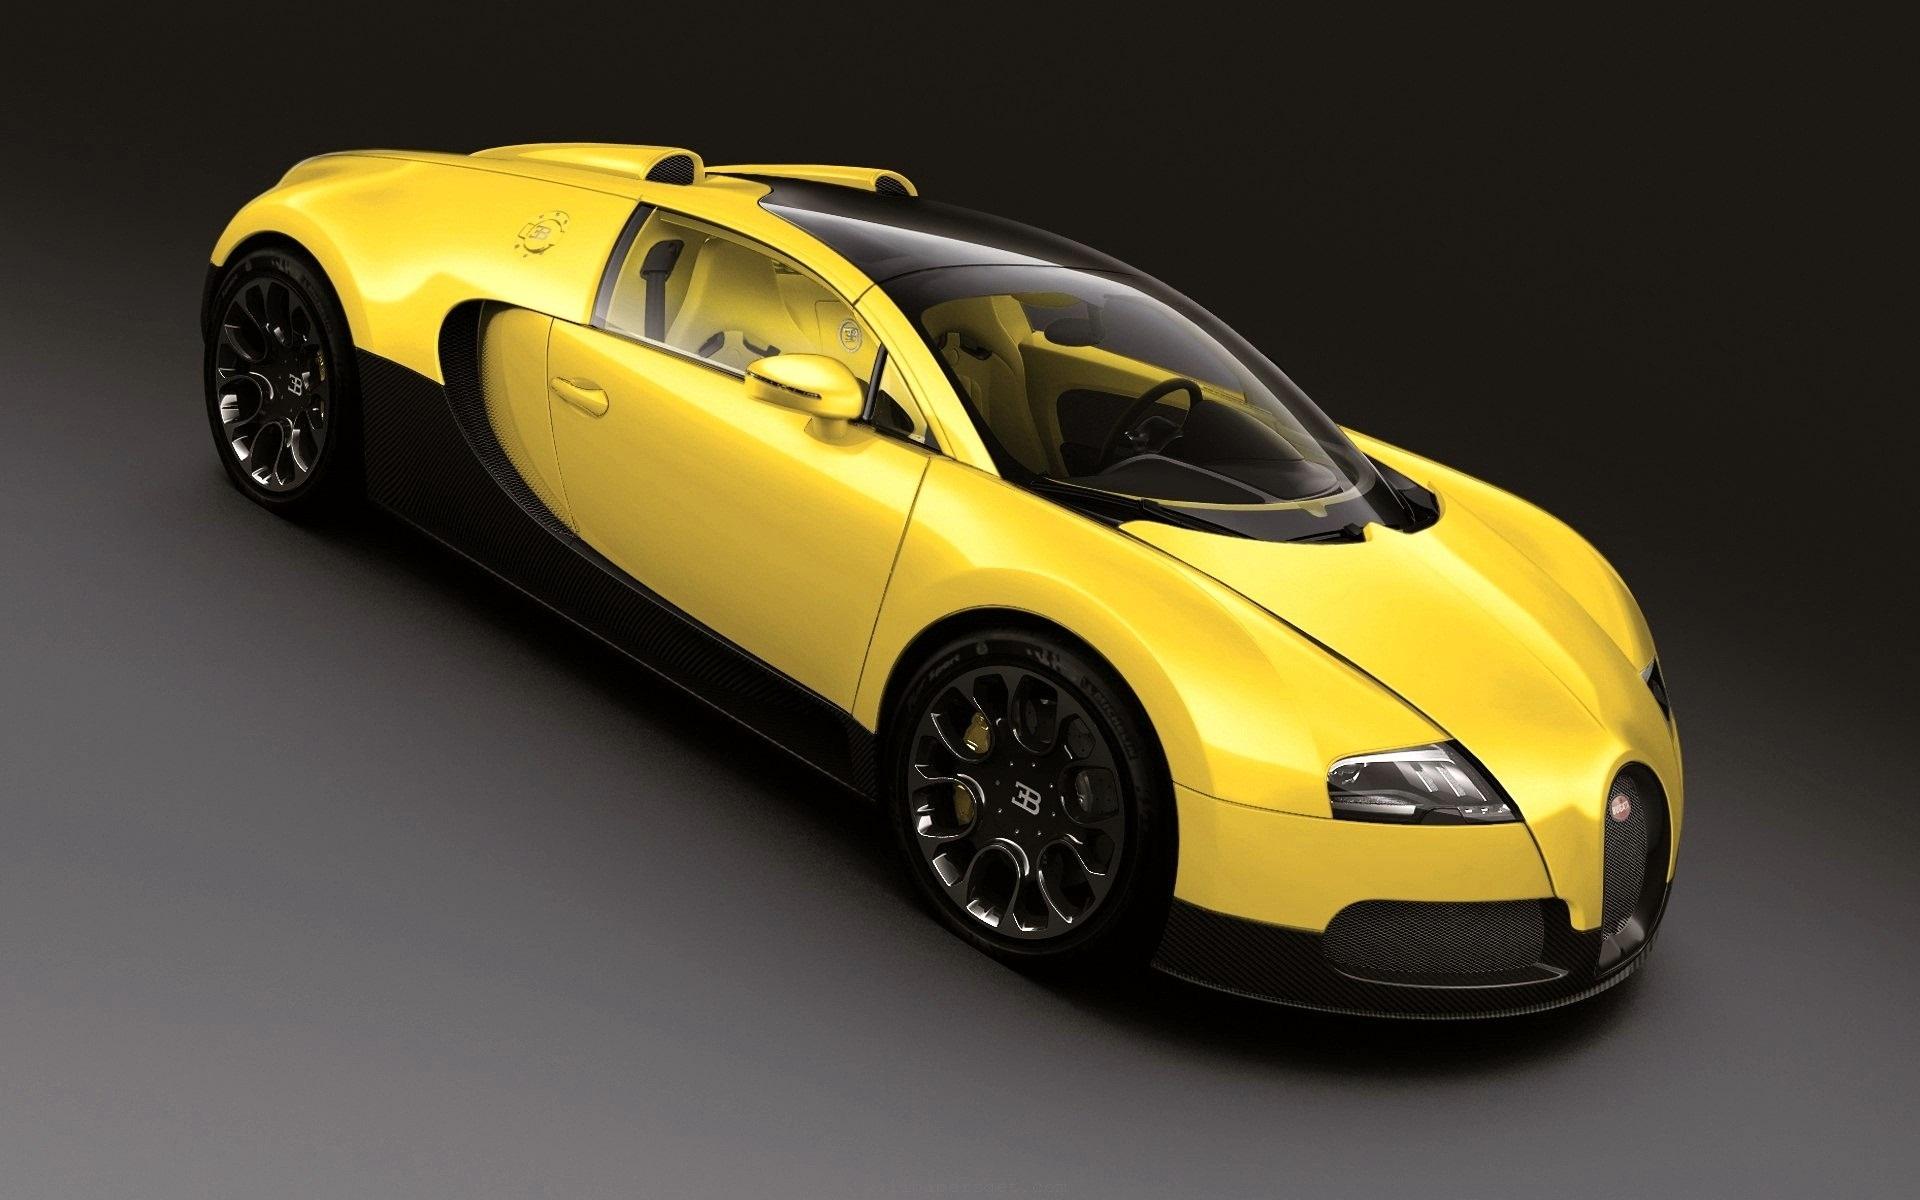 Wallpaper Bugatti Veyron Yellow Supercar 1920x1200 Hd Picture Image